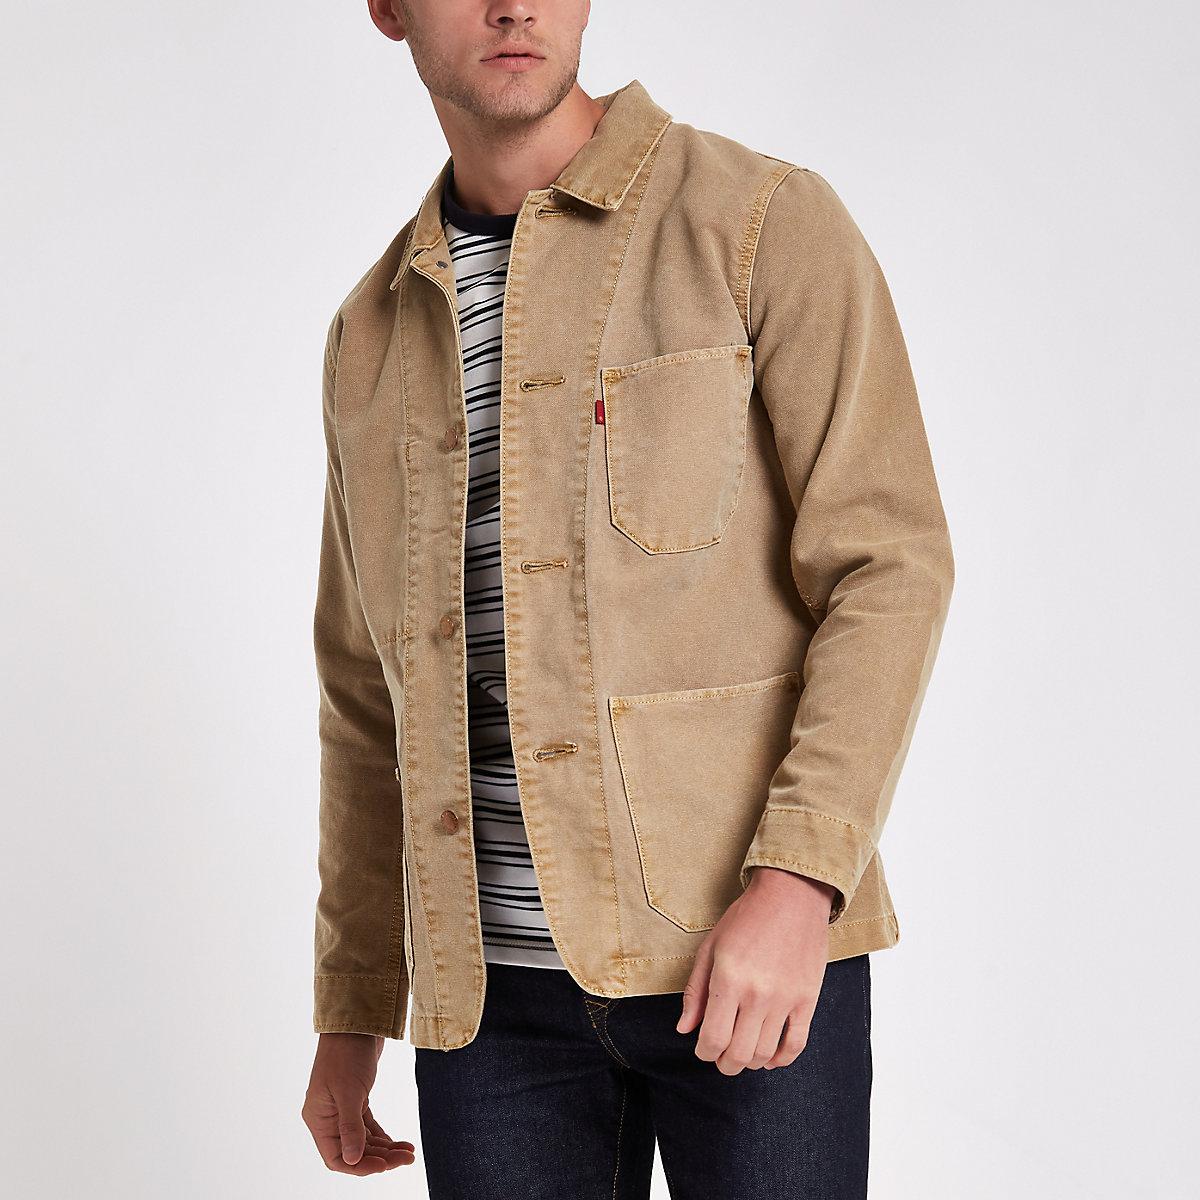 Levi's light brown button-down jacket